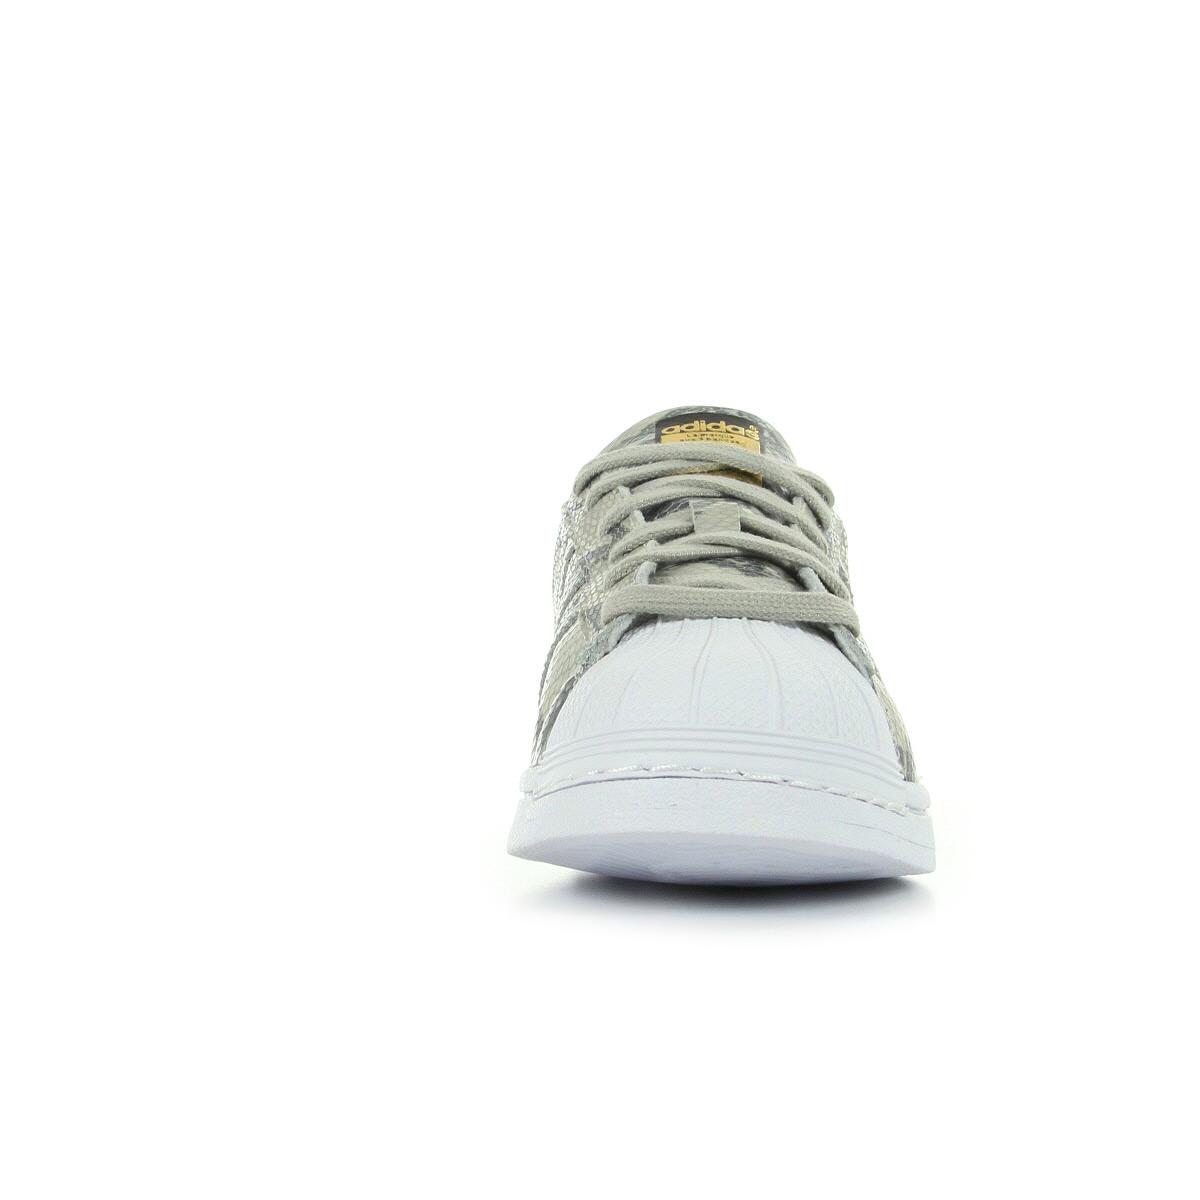 adidas Superstar East River Rival B34375, Baskets mode